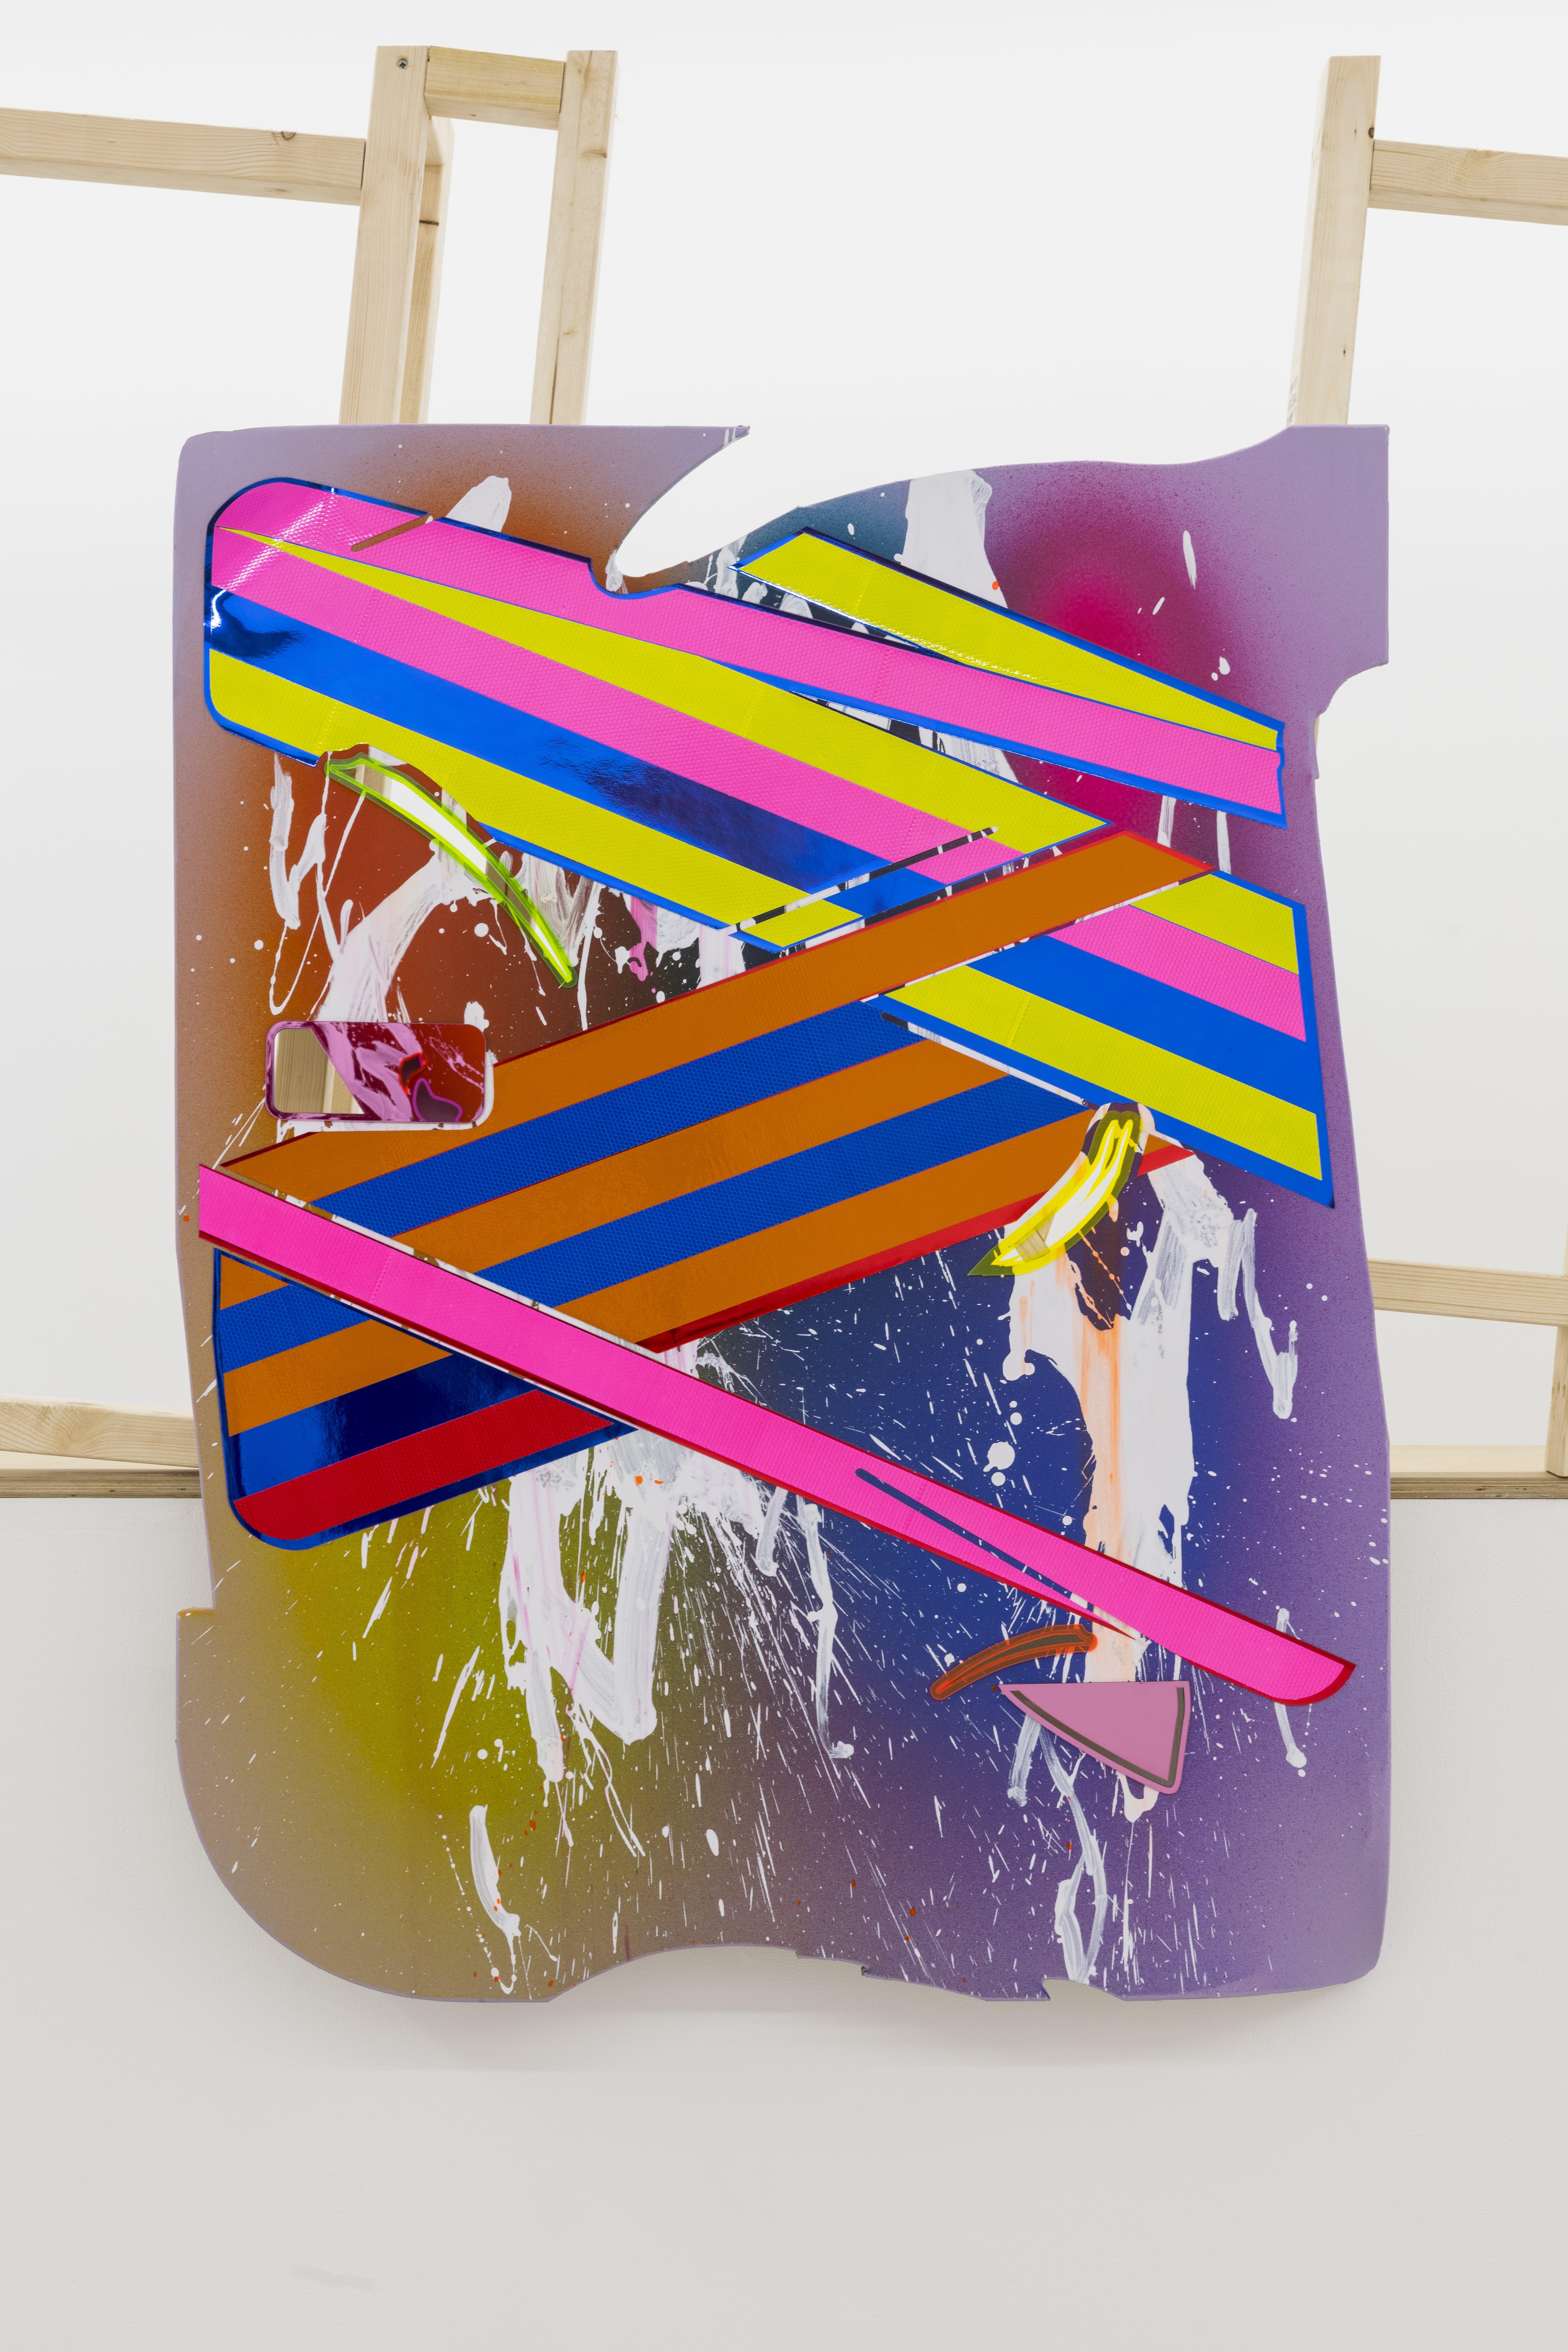 NemesM_Police-Paintings-04_2018_130x100cm_acrylic-light-reflective-vinyl-mirror-paper-lasercut-perspex-canvas-wood-min